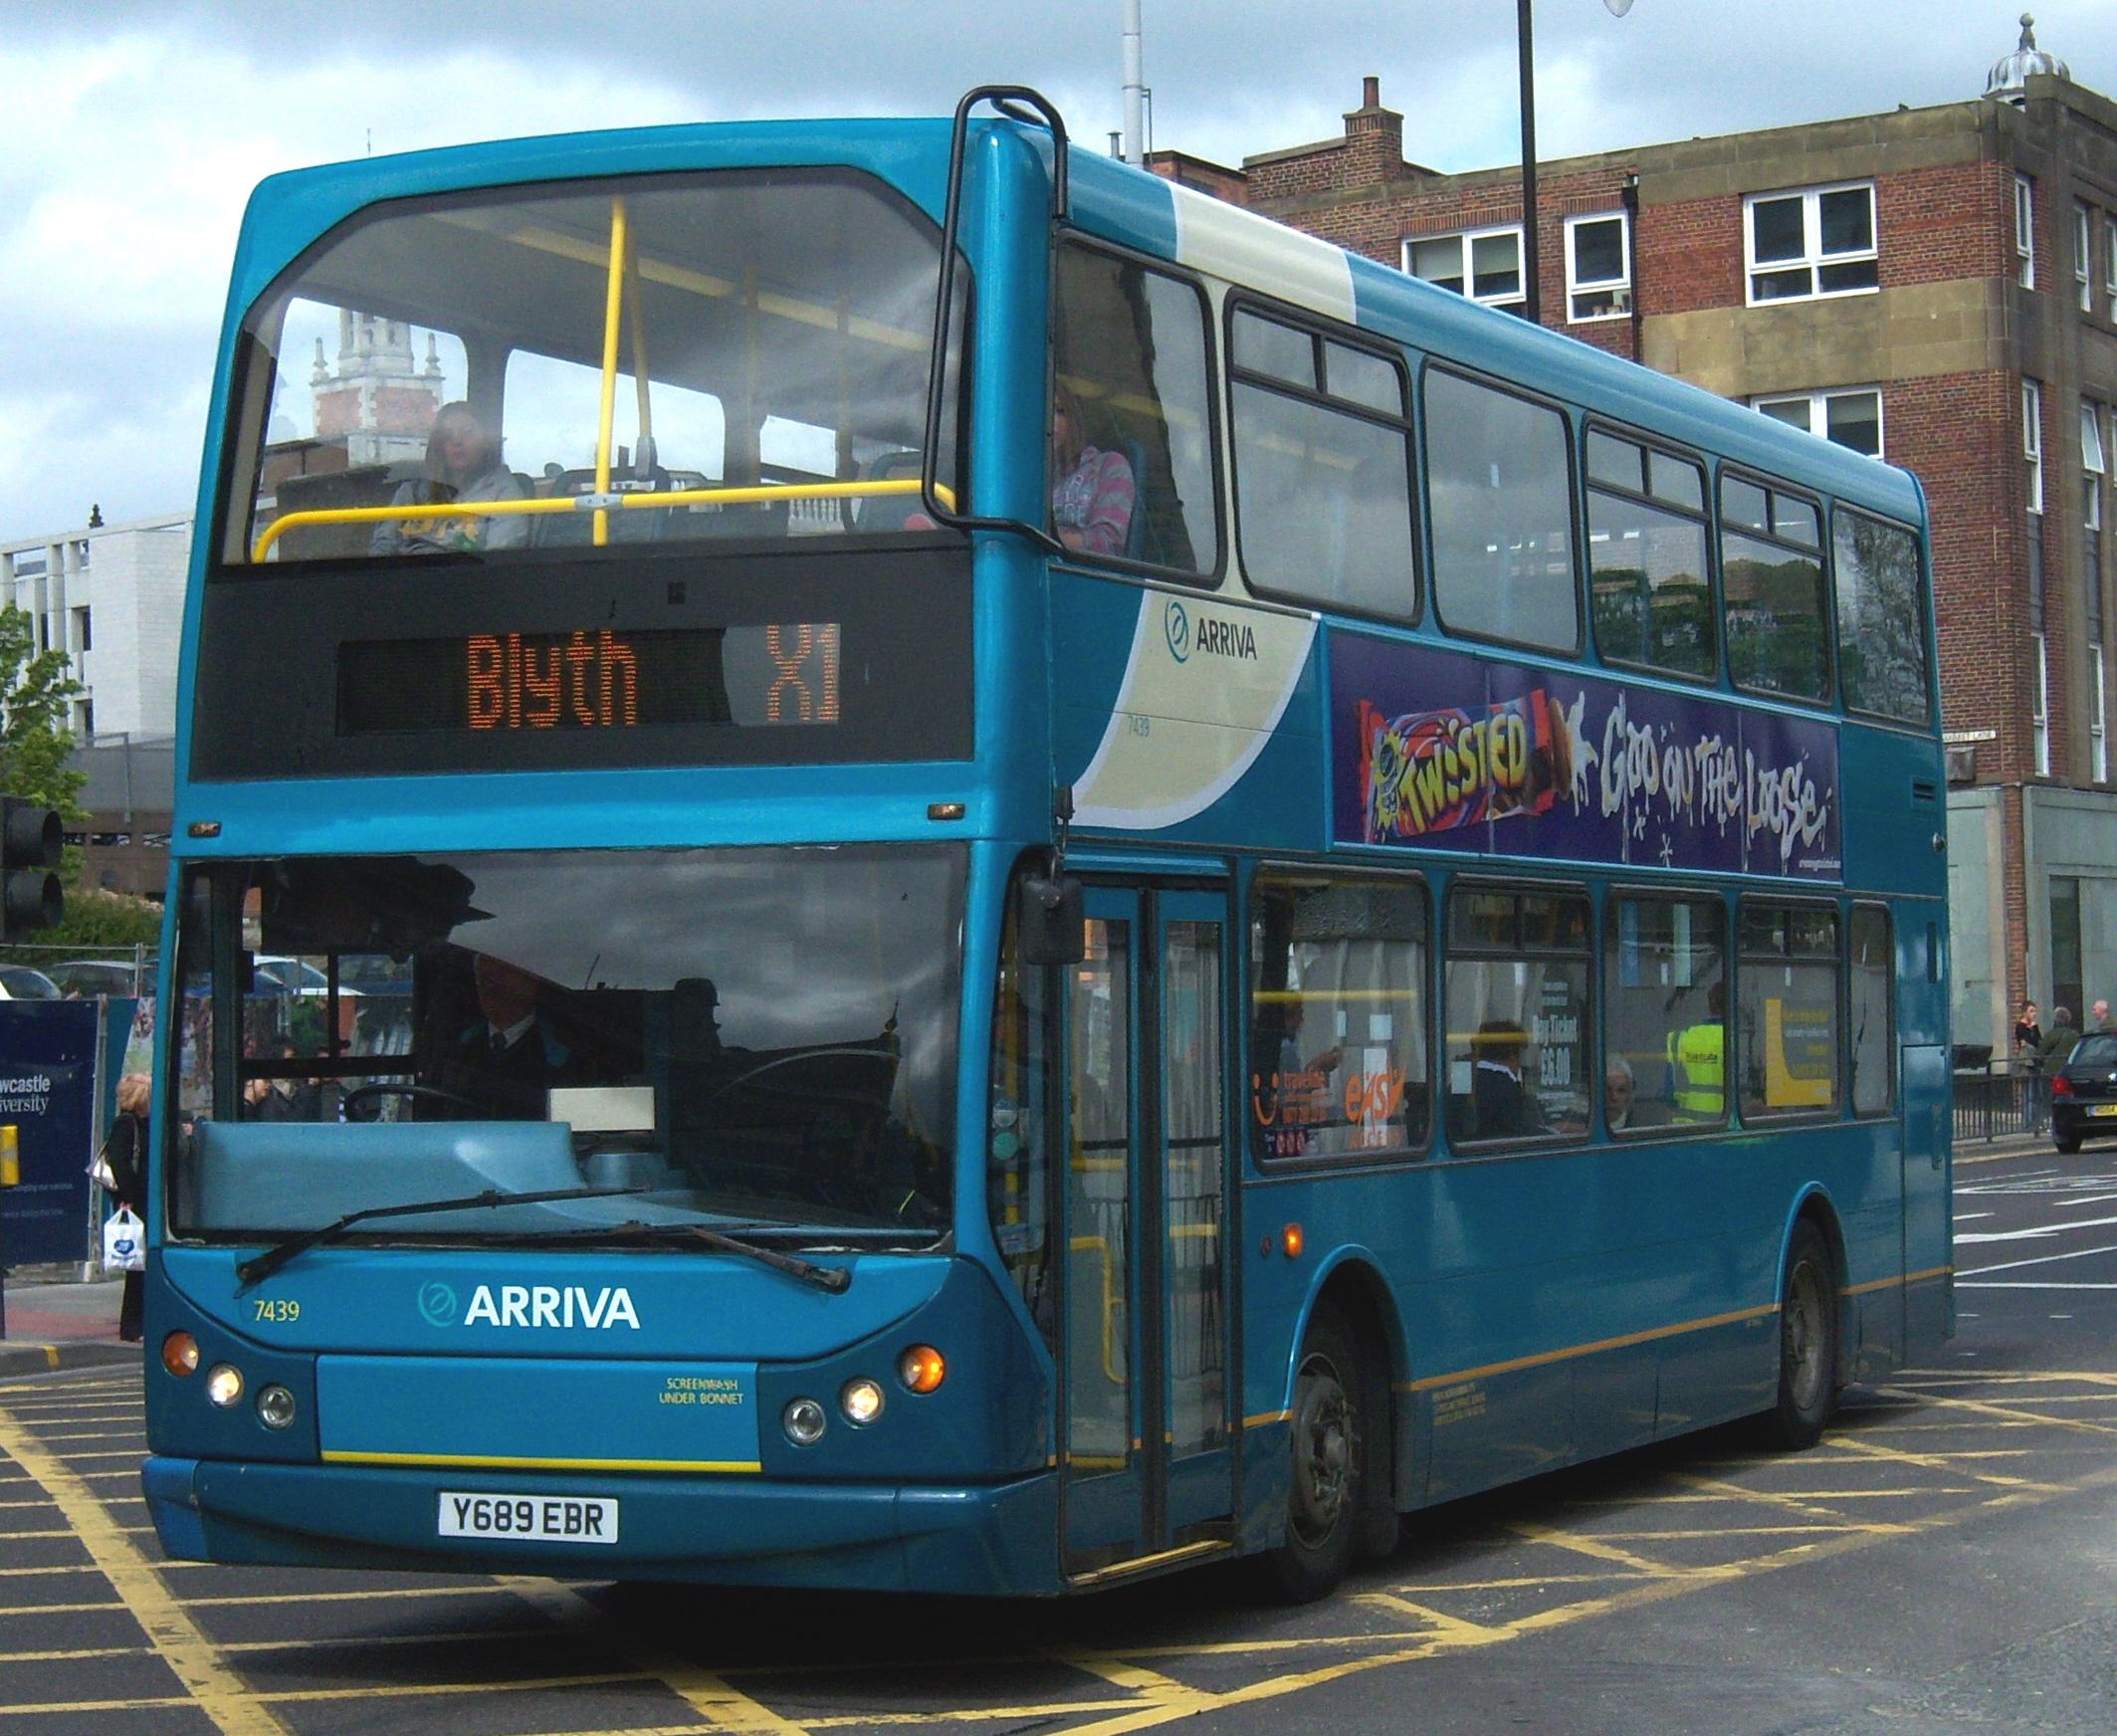 Arriva Bus Depot Tunbridge Wells Lost Property